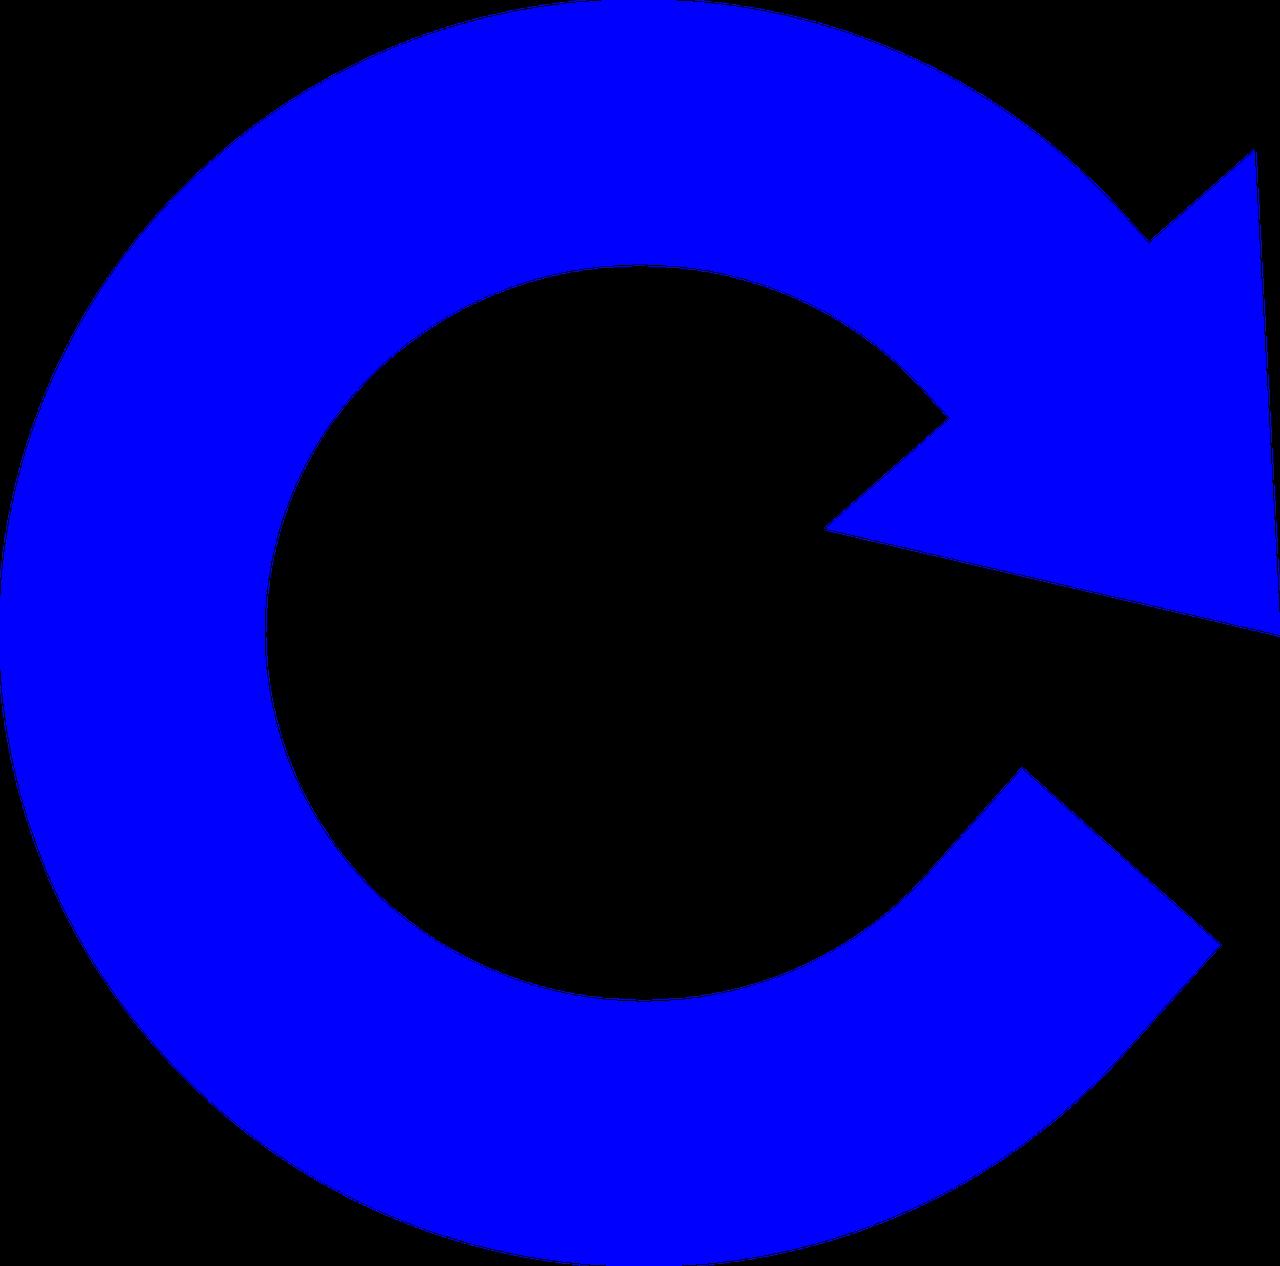 circle-shaped arrow